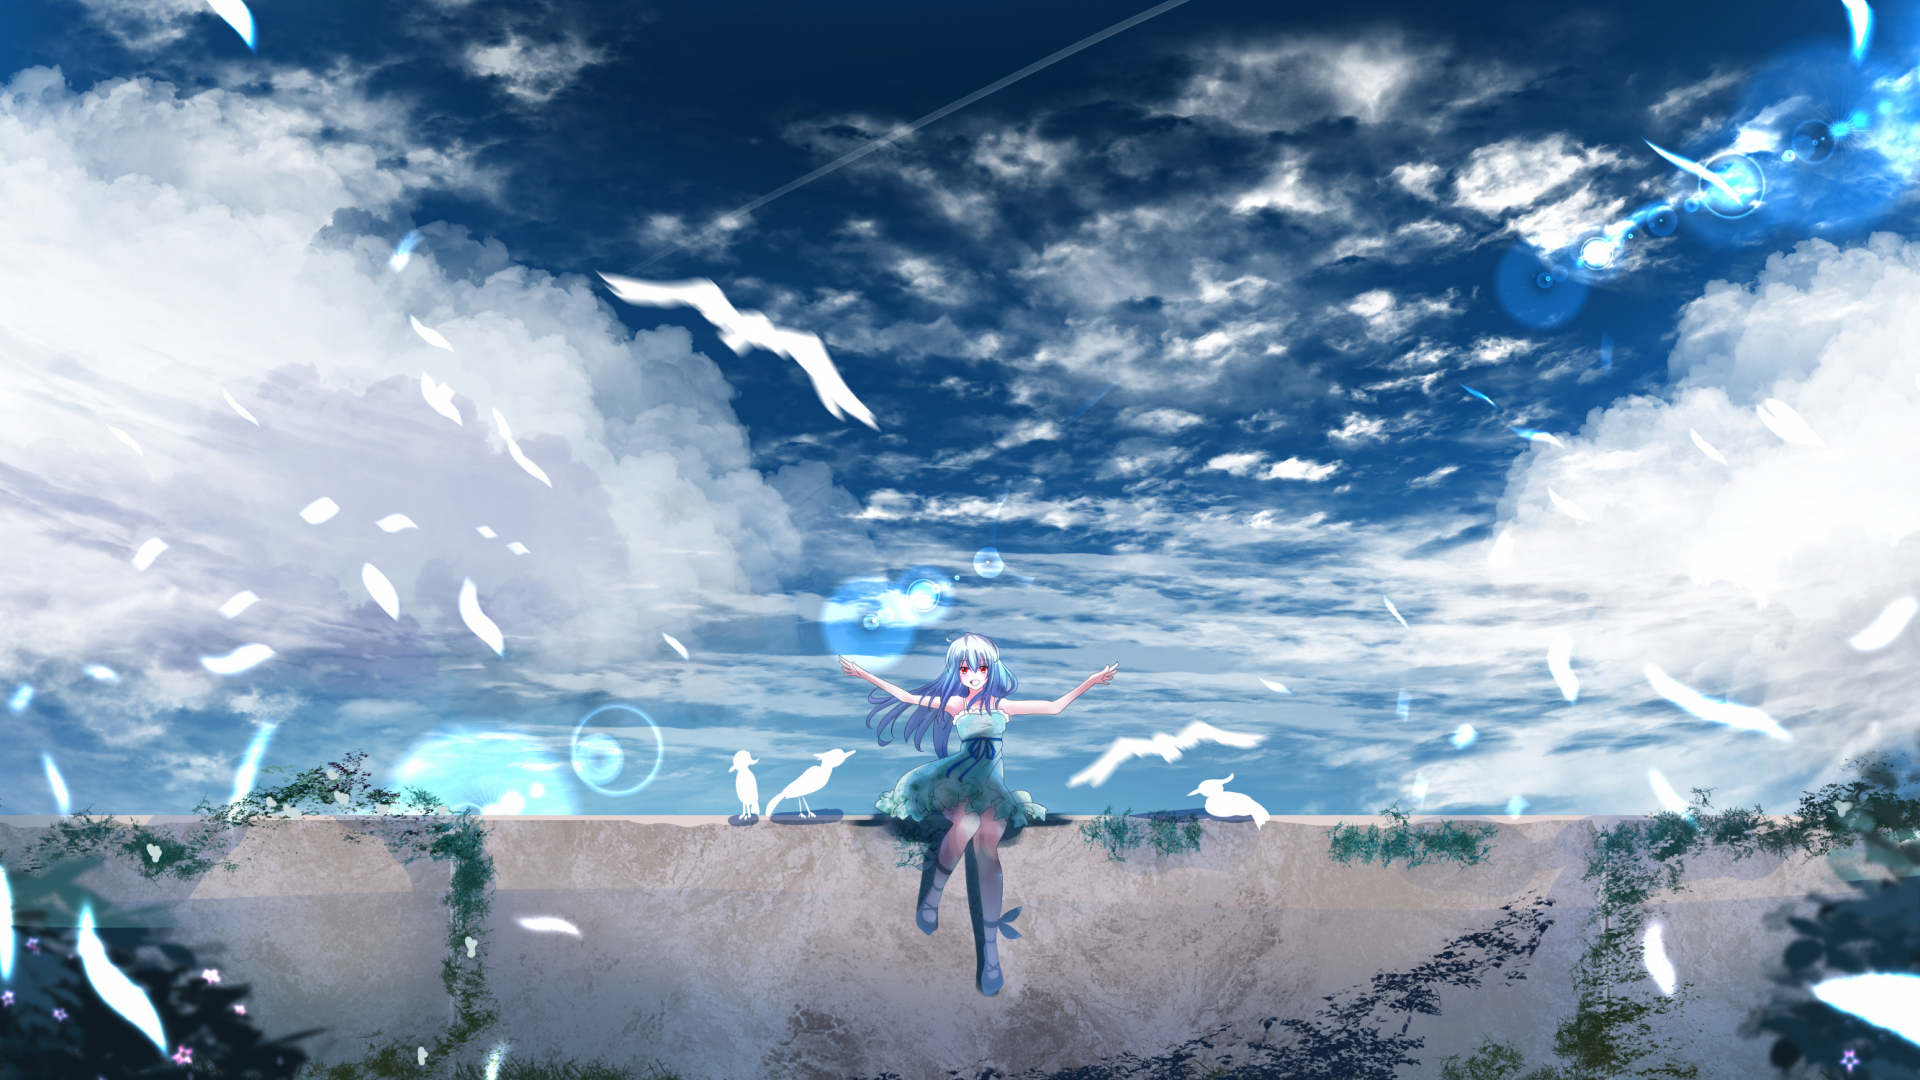 Download 1920x1080 Wallpaper Beautiful Scenery Anime Outdoor